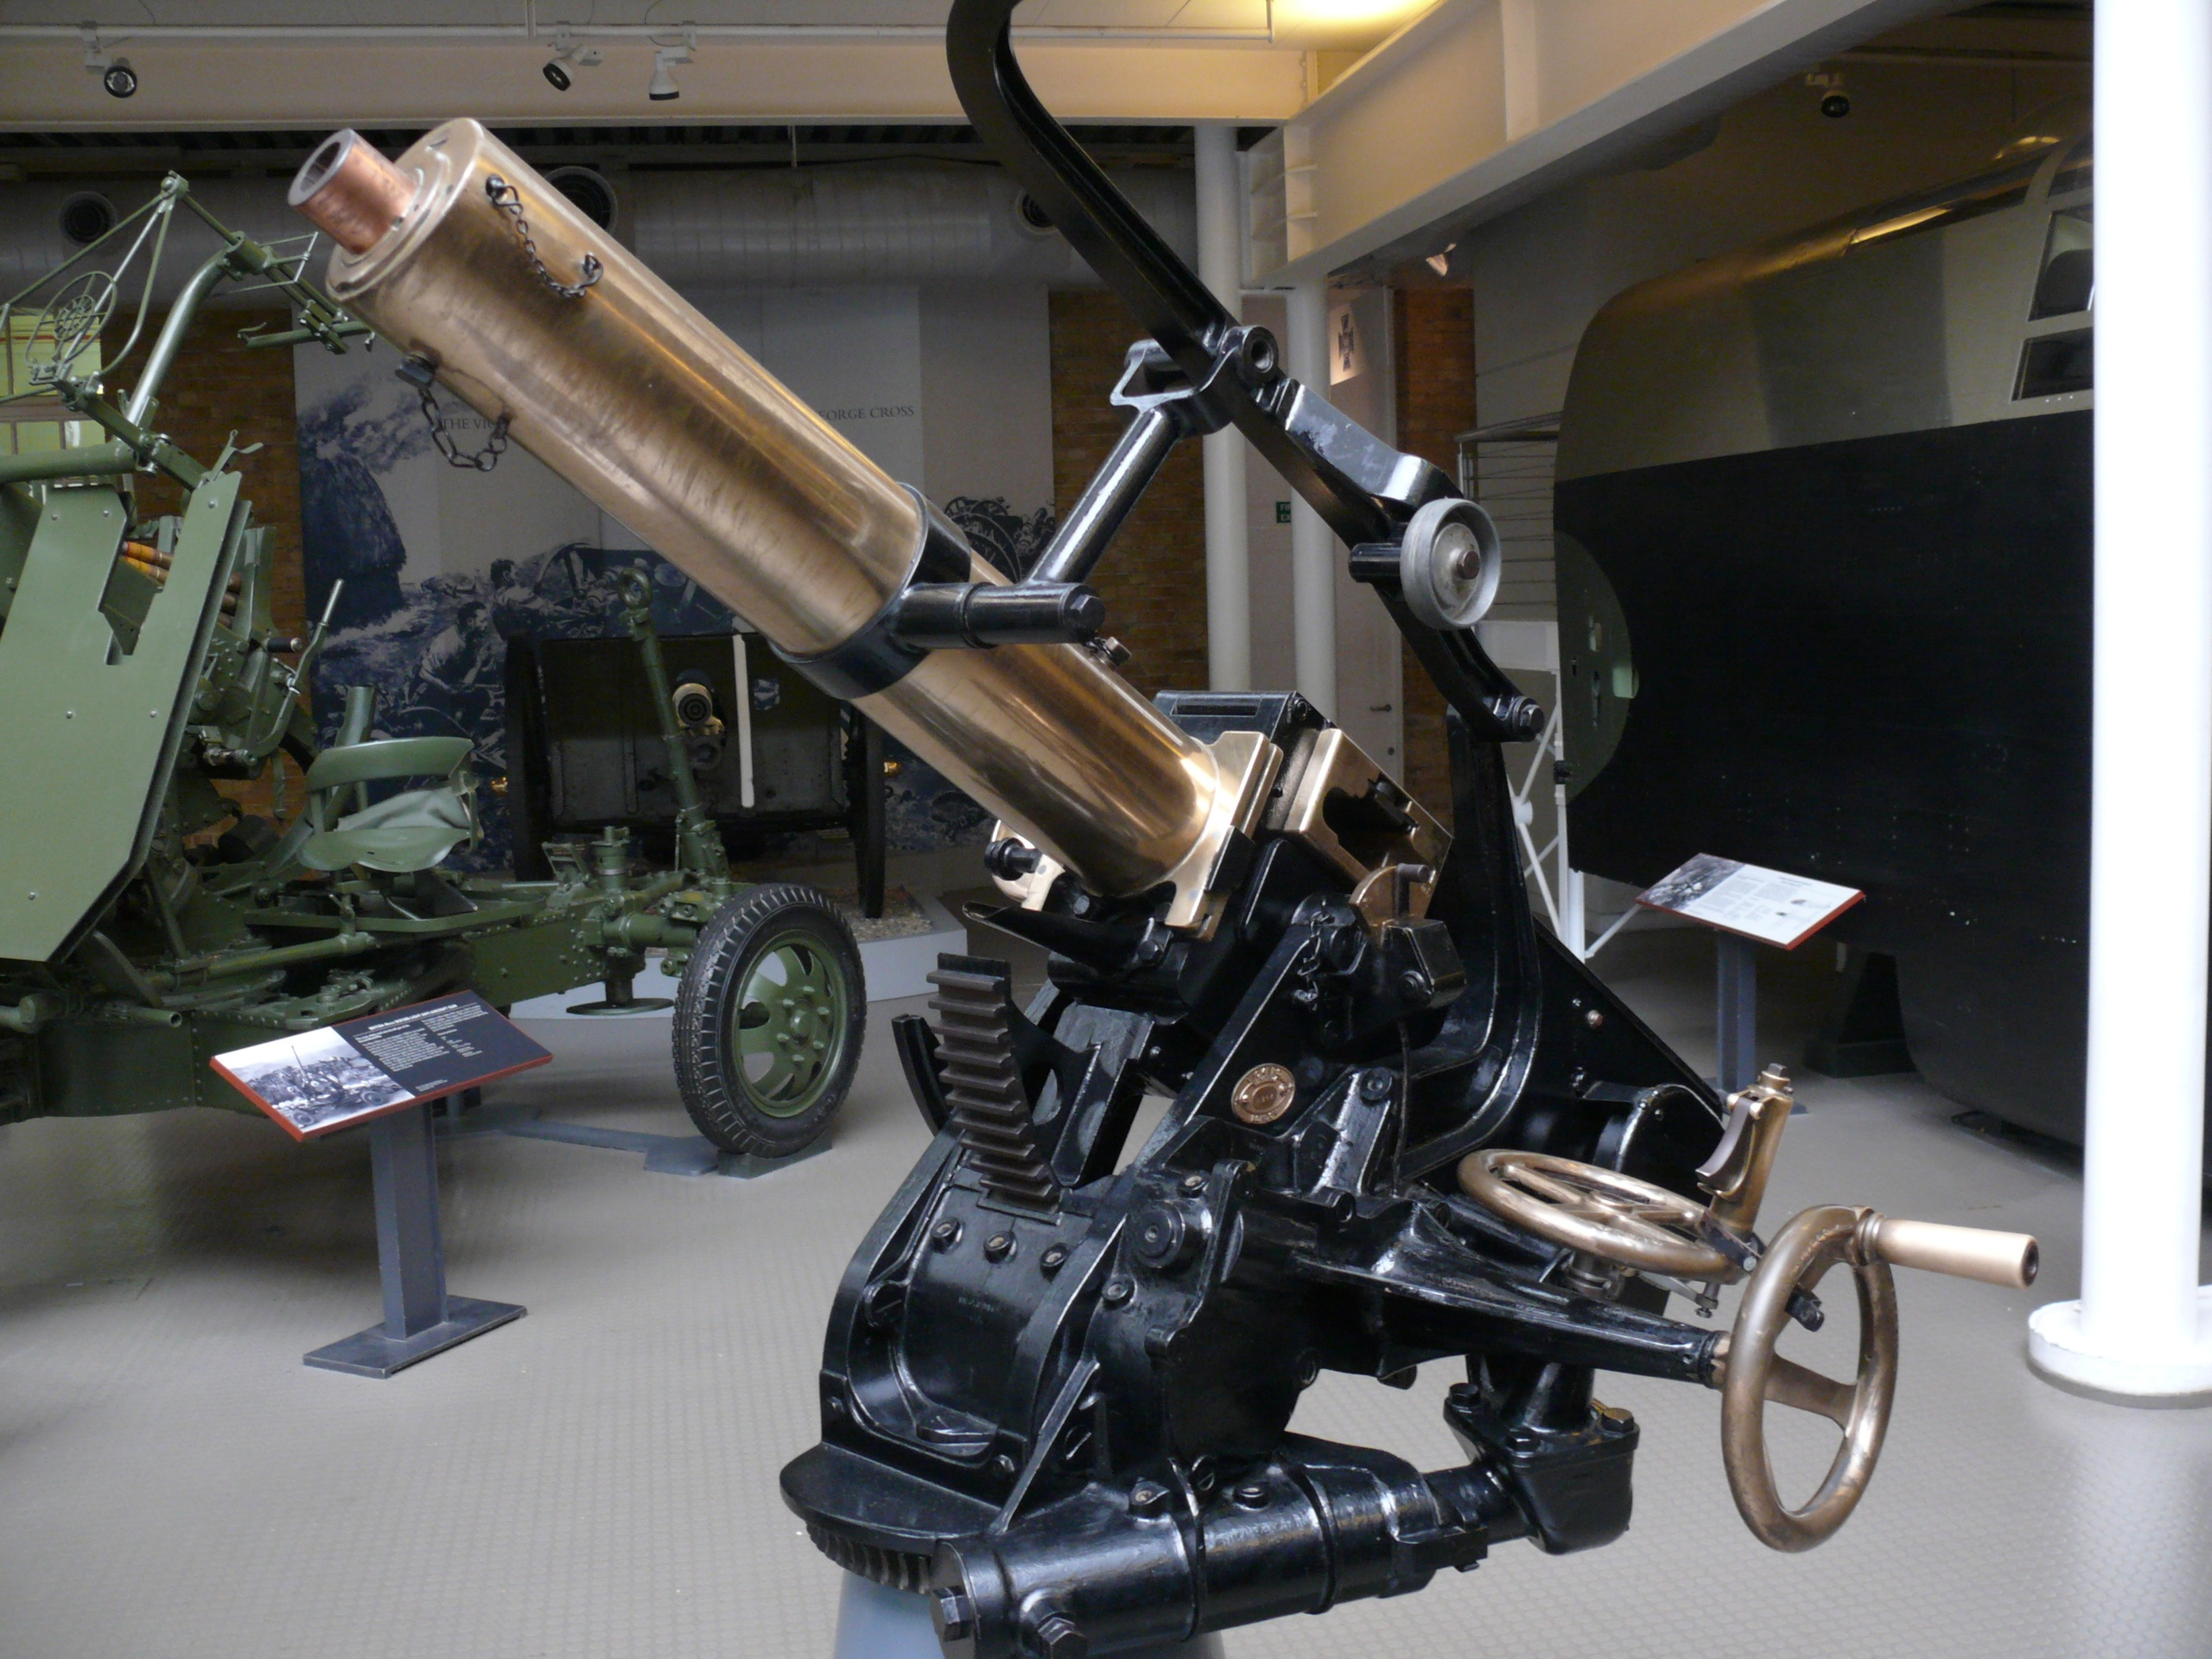 Автоматические пушки 37 mm «Maxim Pom-Pom» и 40 mm «Vickers» (Великобритания)